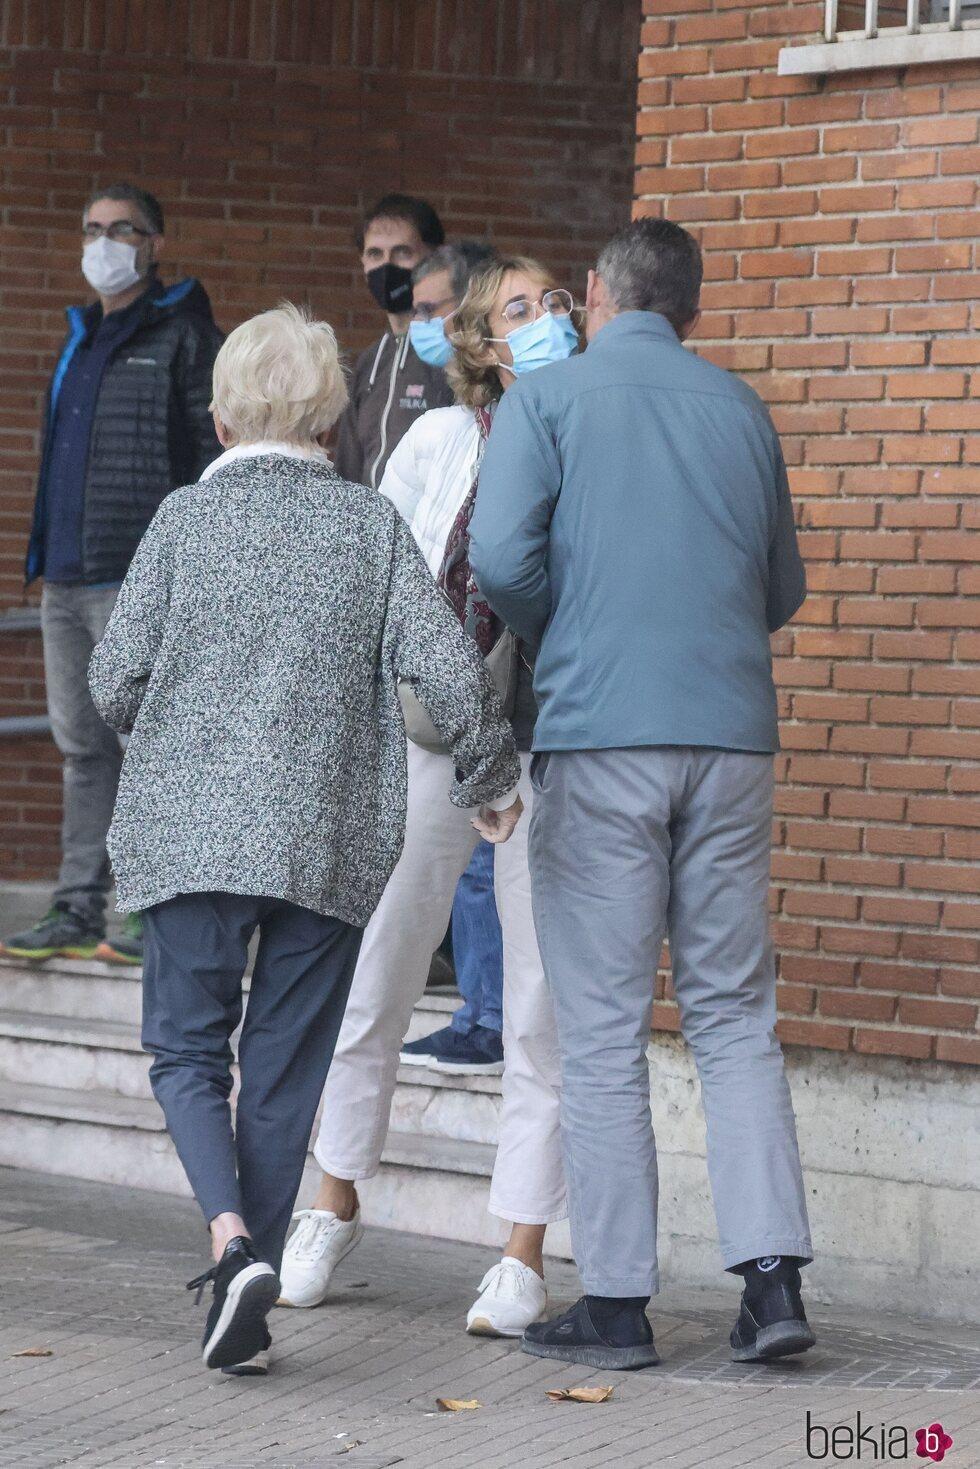 Iñaki Urdangarin y su madre Claire Lieabert saludan a Lucía Urdangarin en Vitoria